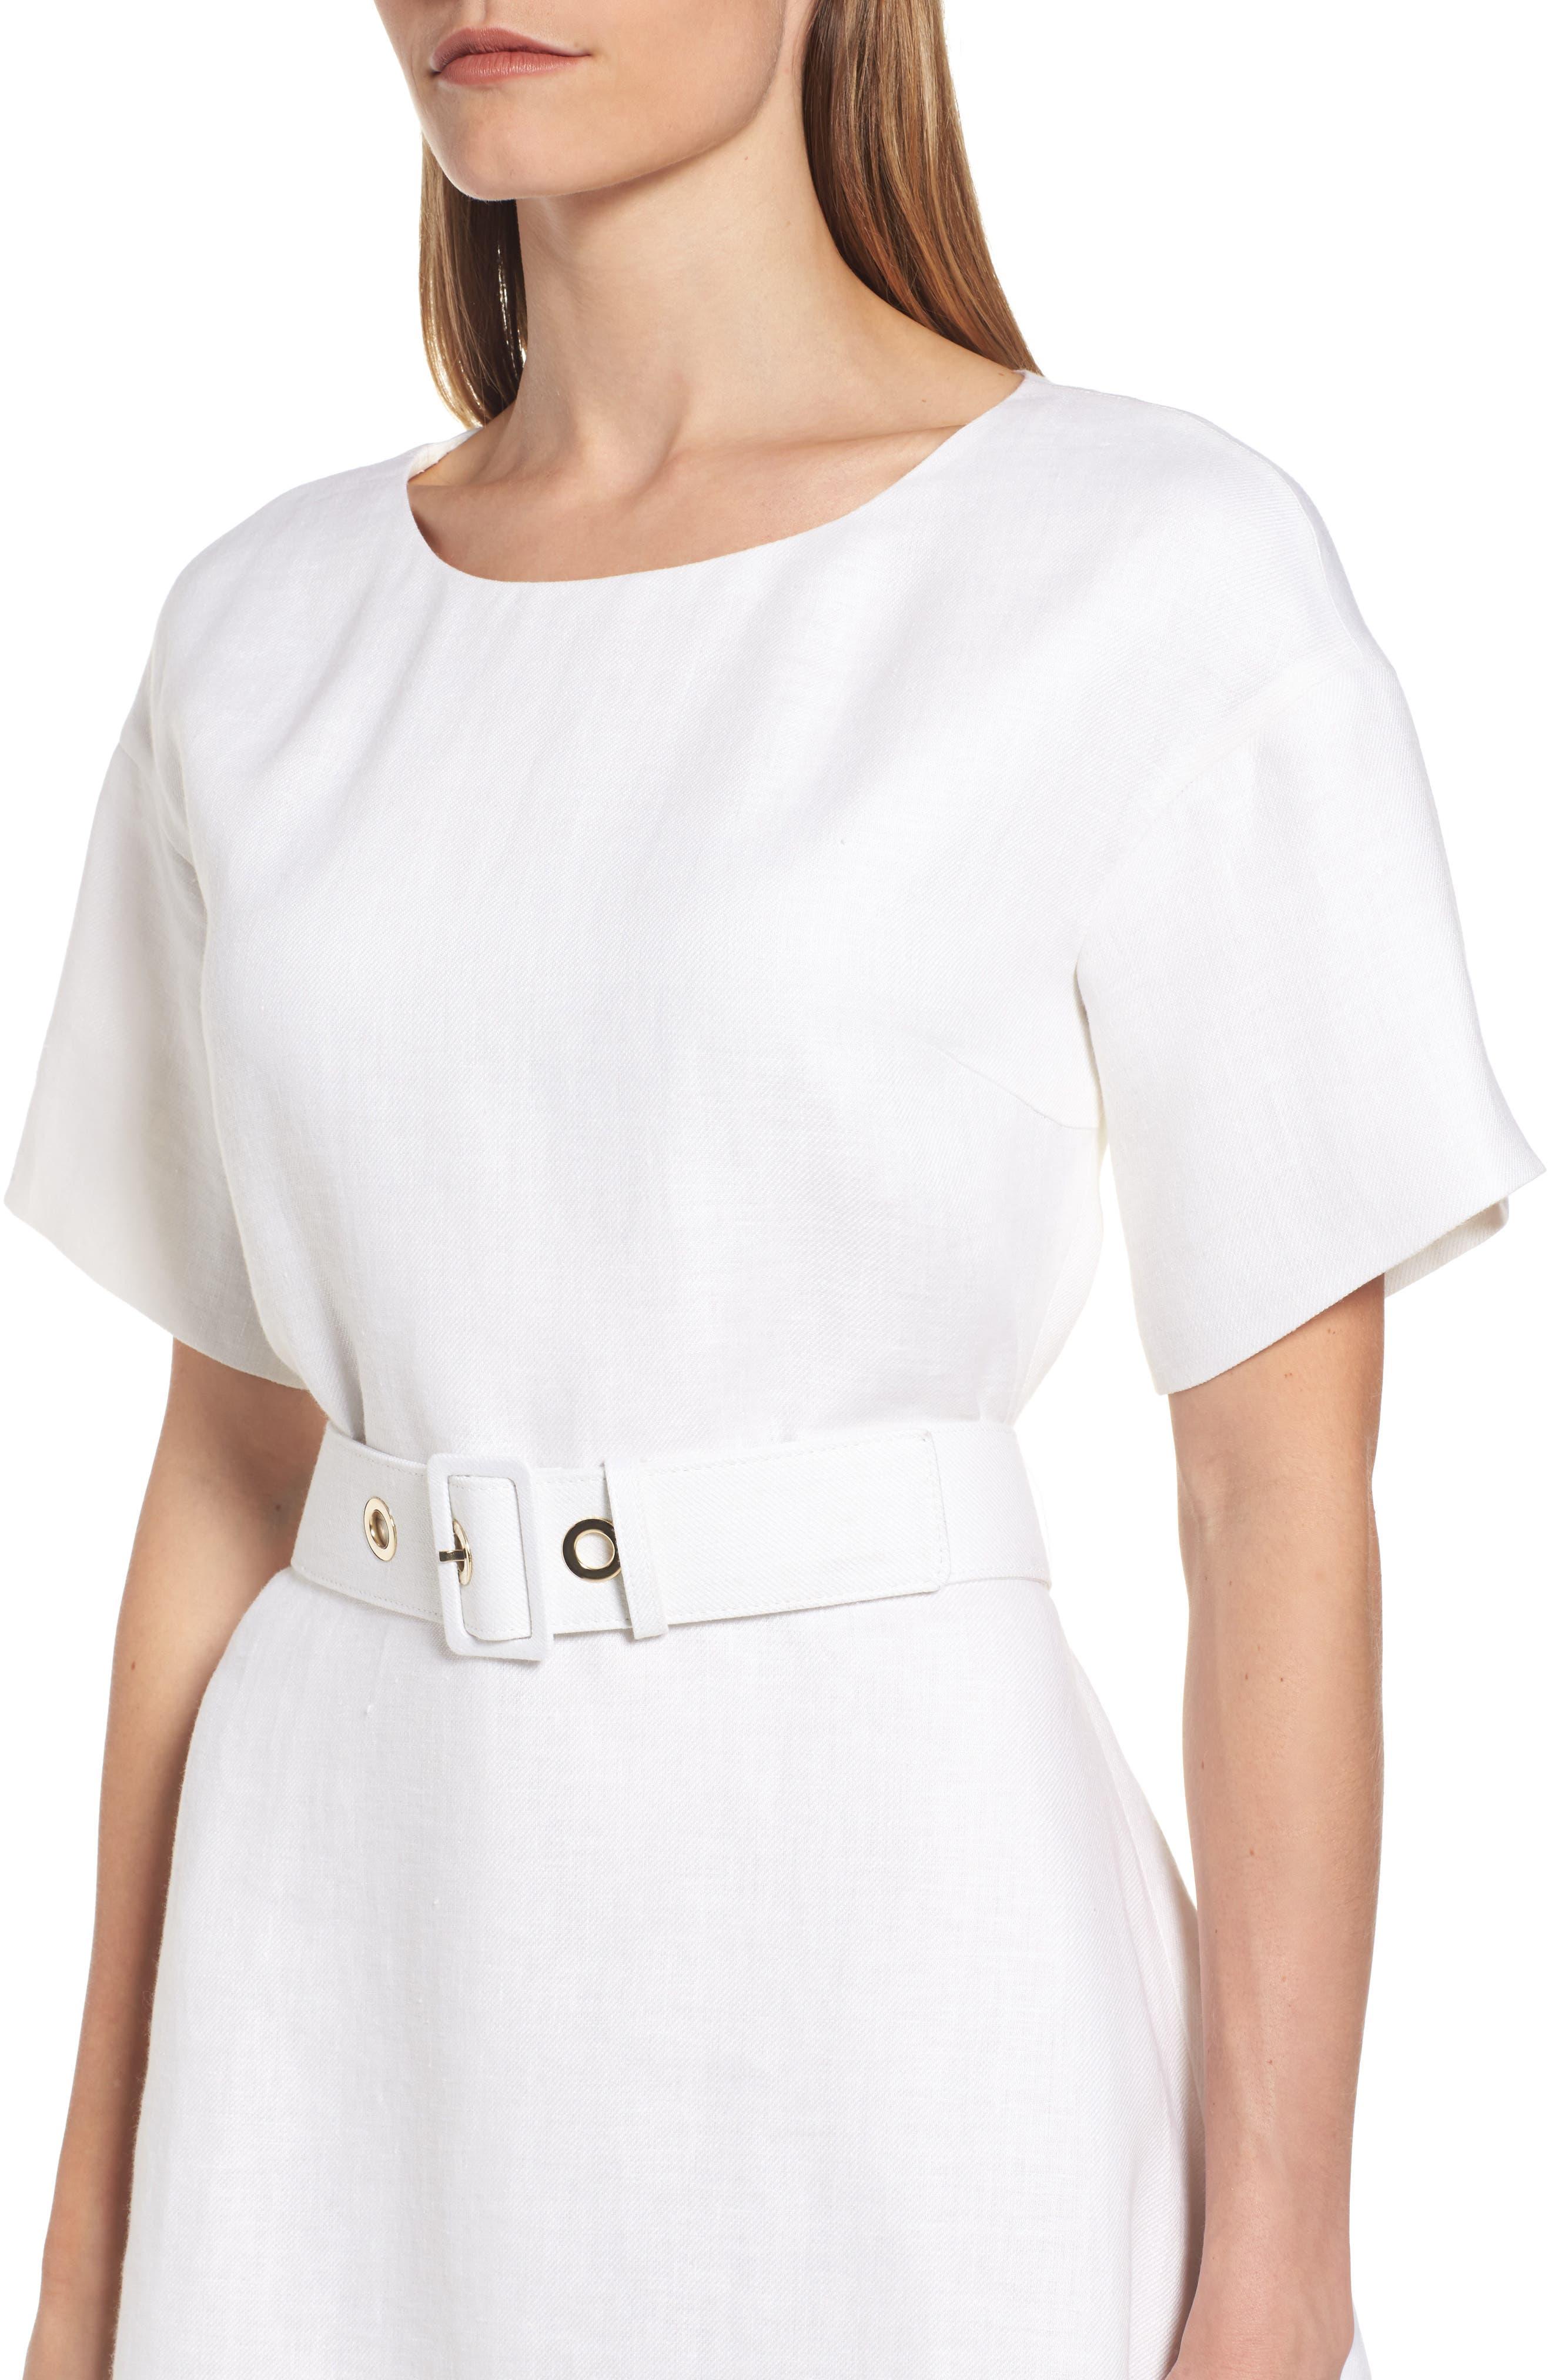 Dimisa Linen Belted A-Line Dress,                             Alternate thumbnail 4, color,